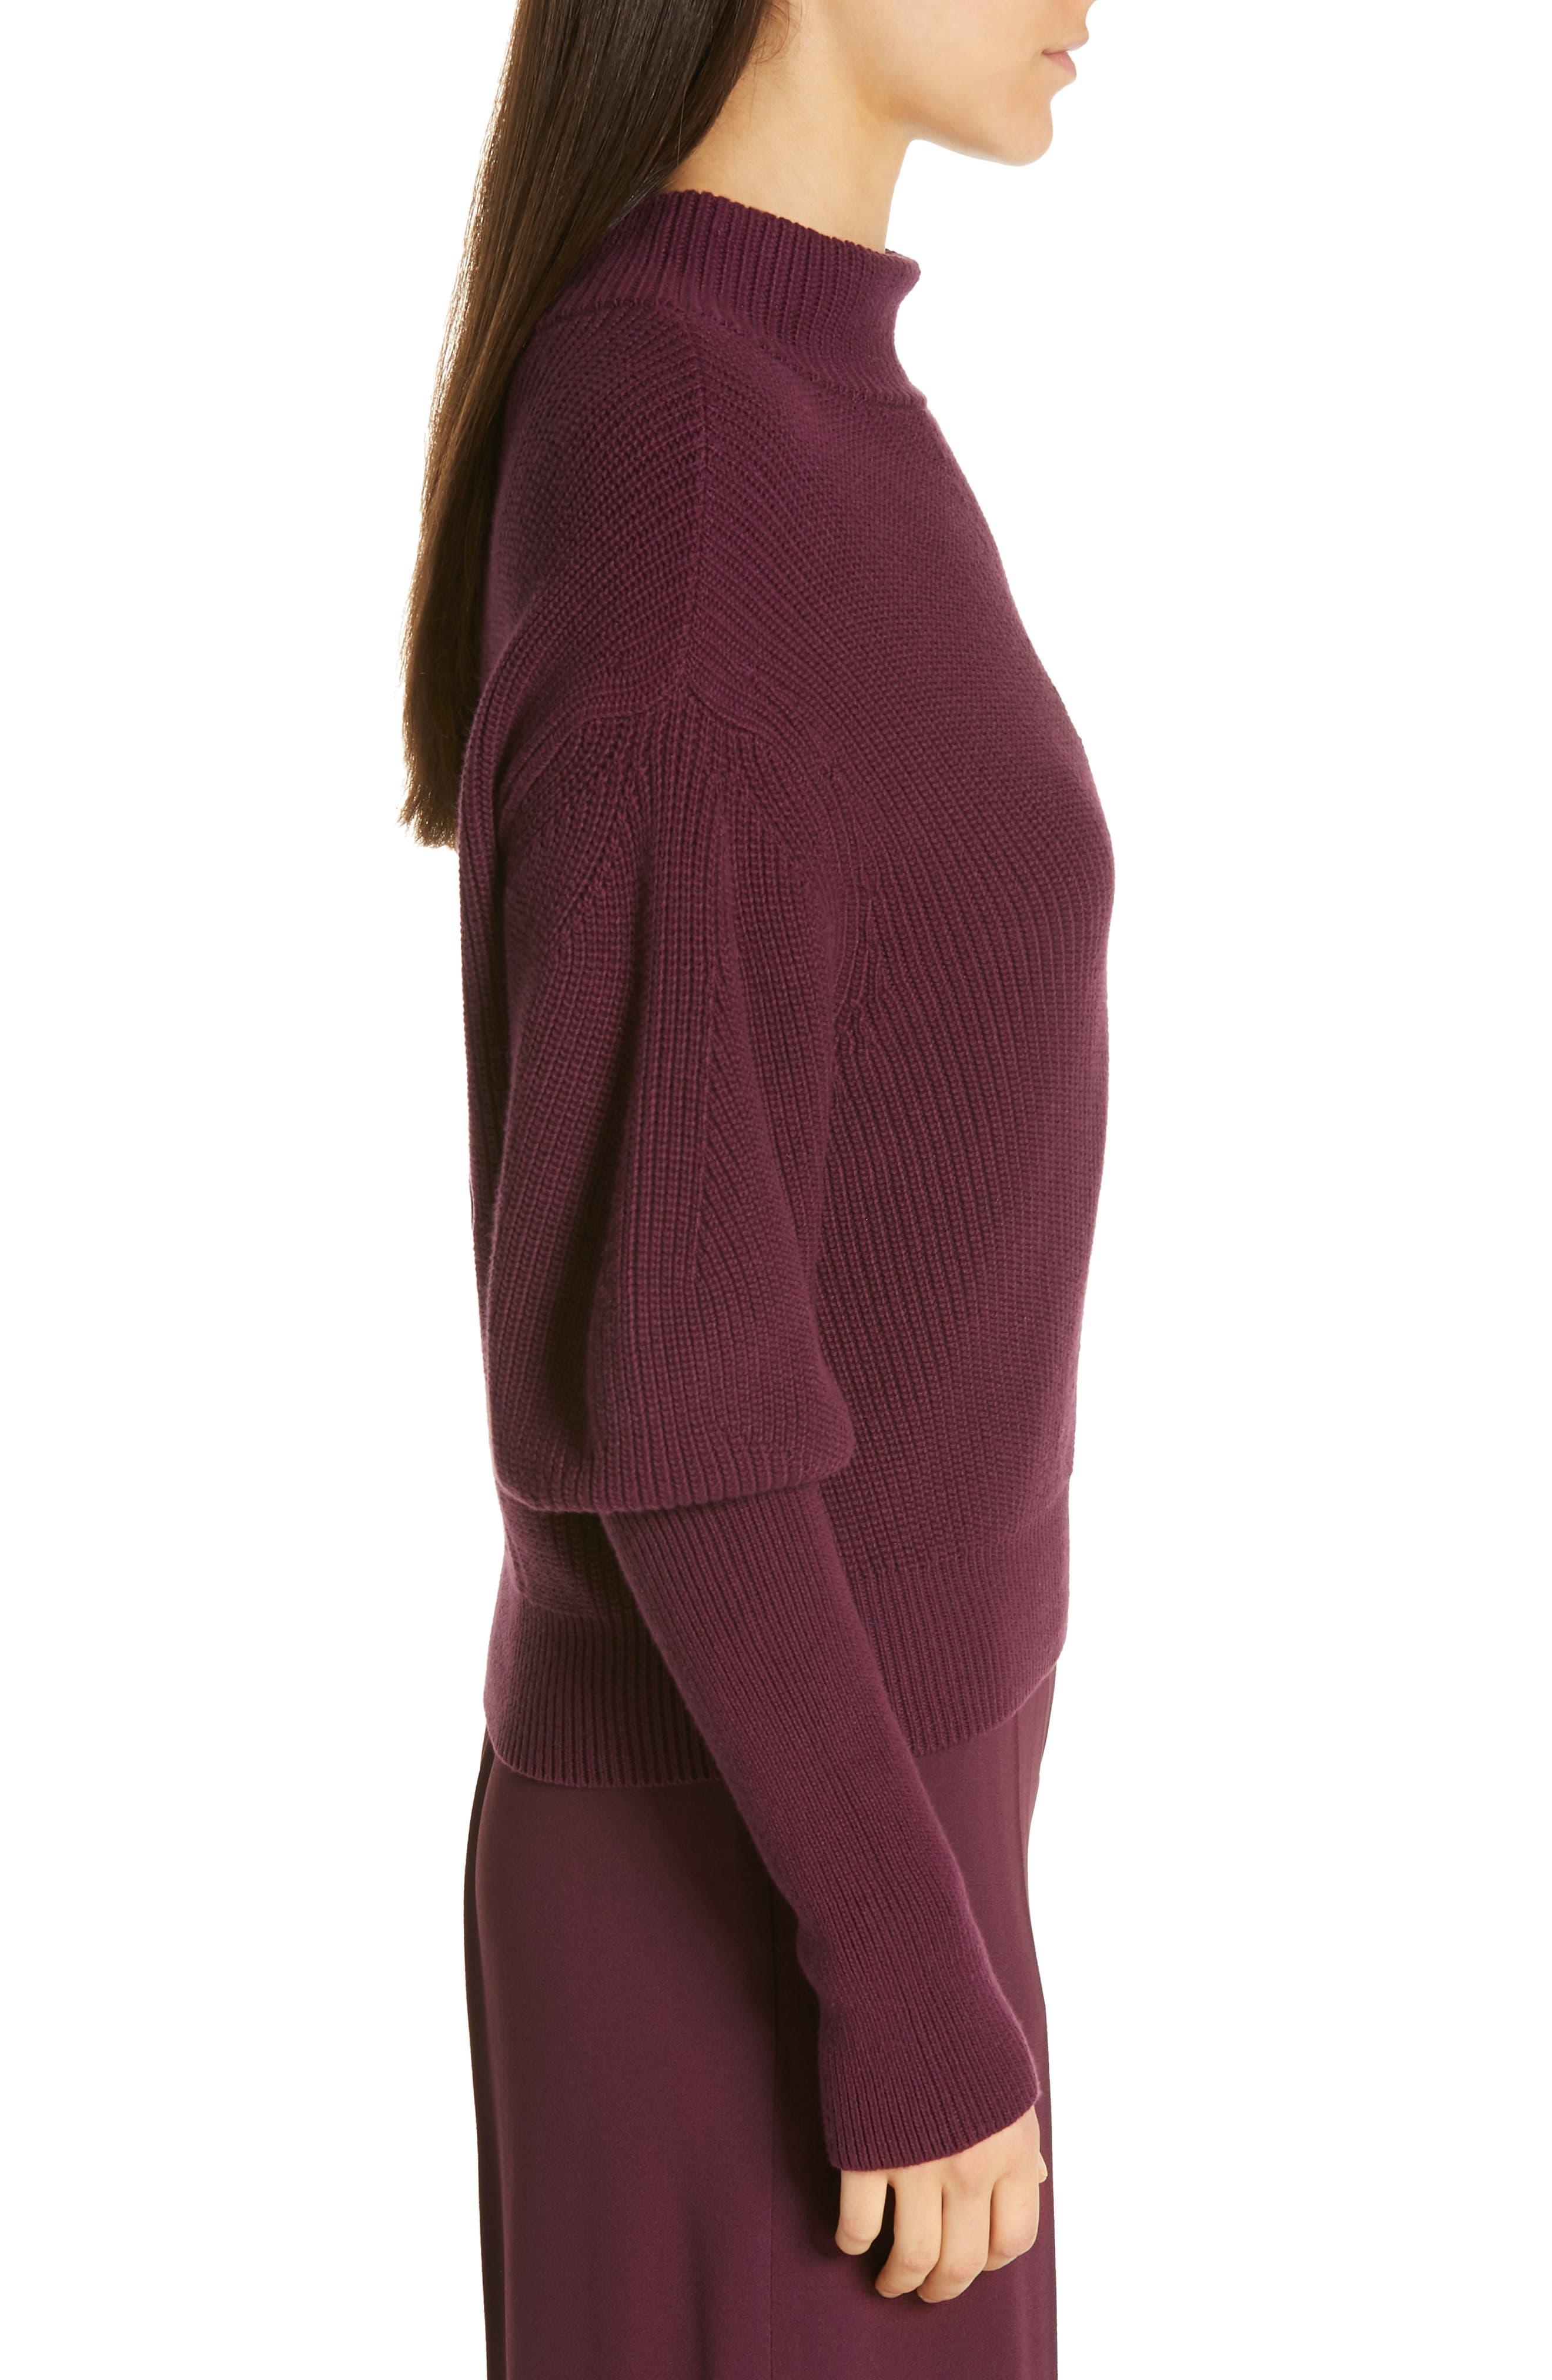 Flix Balloon Sleeve Sweater,                             Alternate thumbnail 3, color,                             DARK BERRY